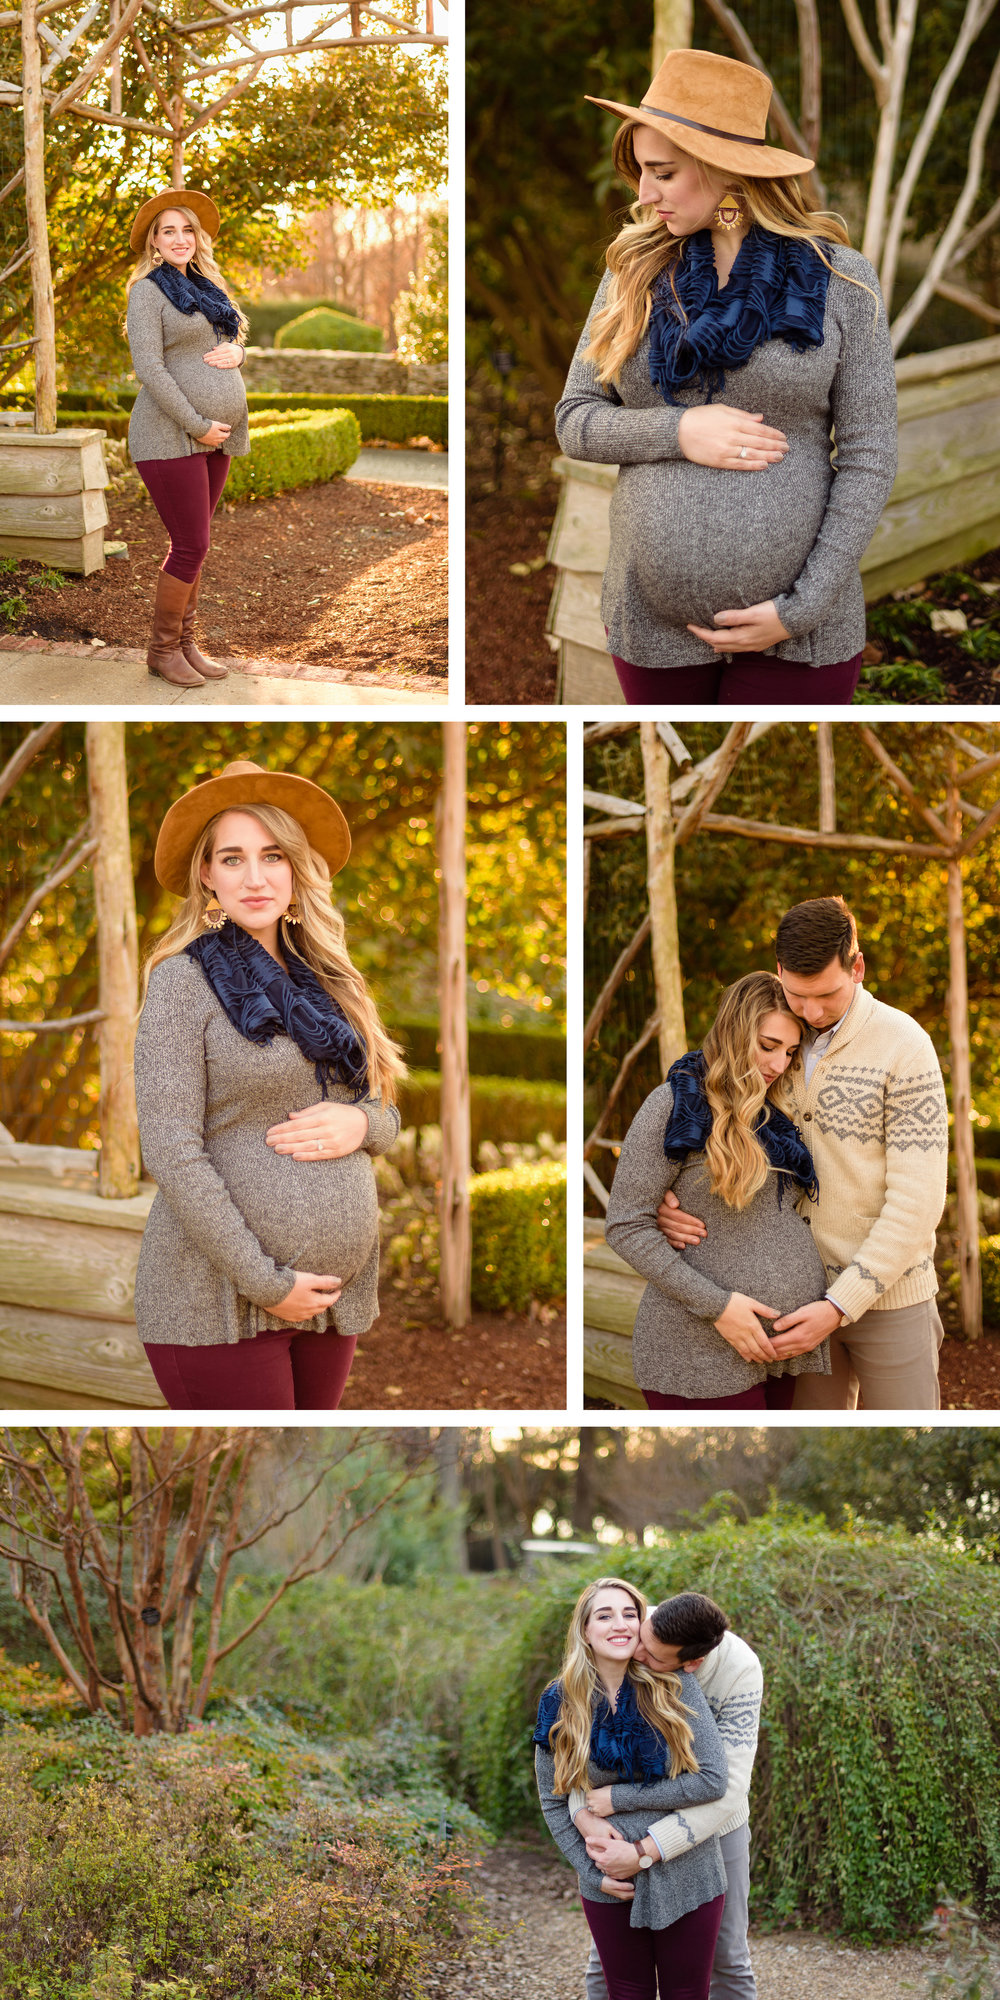 winter-dallas-arboretum-maternity-couple-photo-session-blog-5.jpg